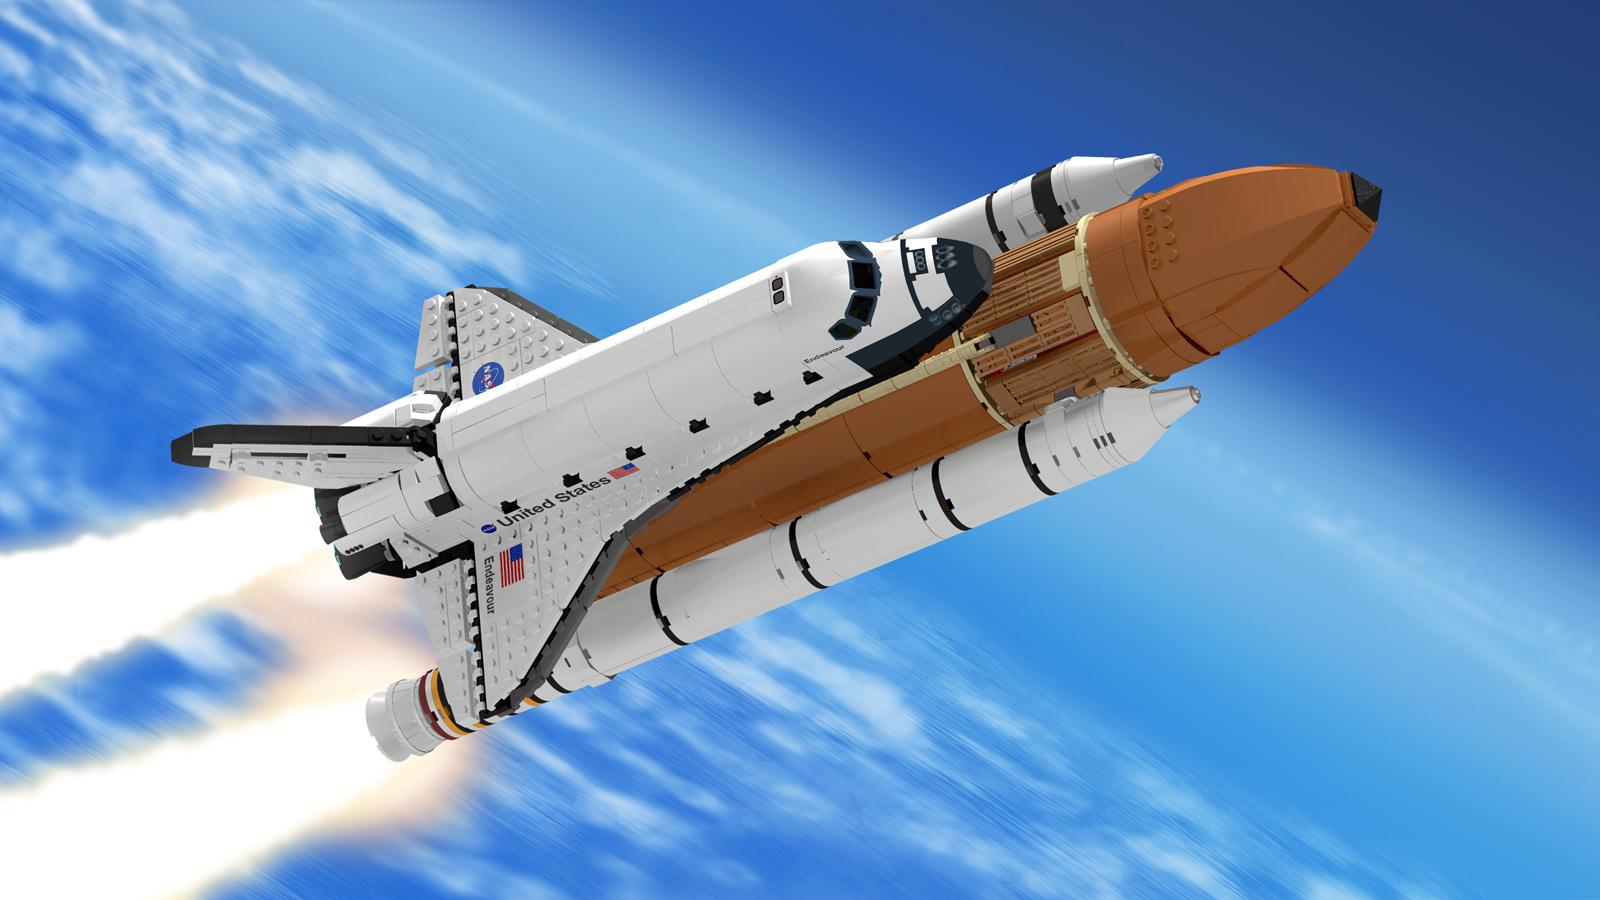 space shuttle program nasa - photo #39